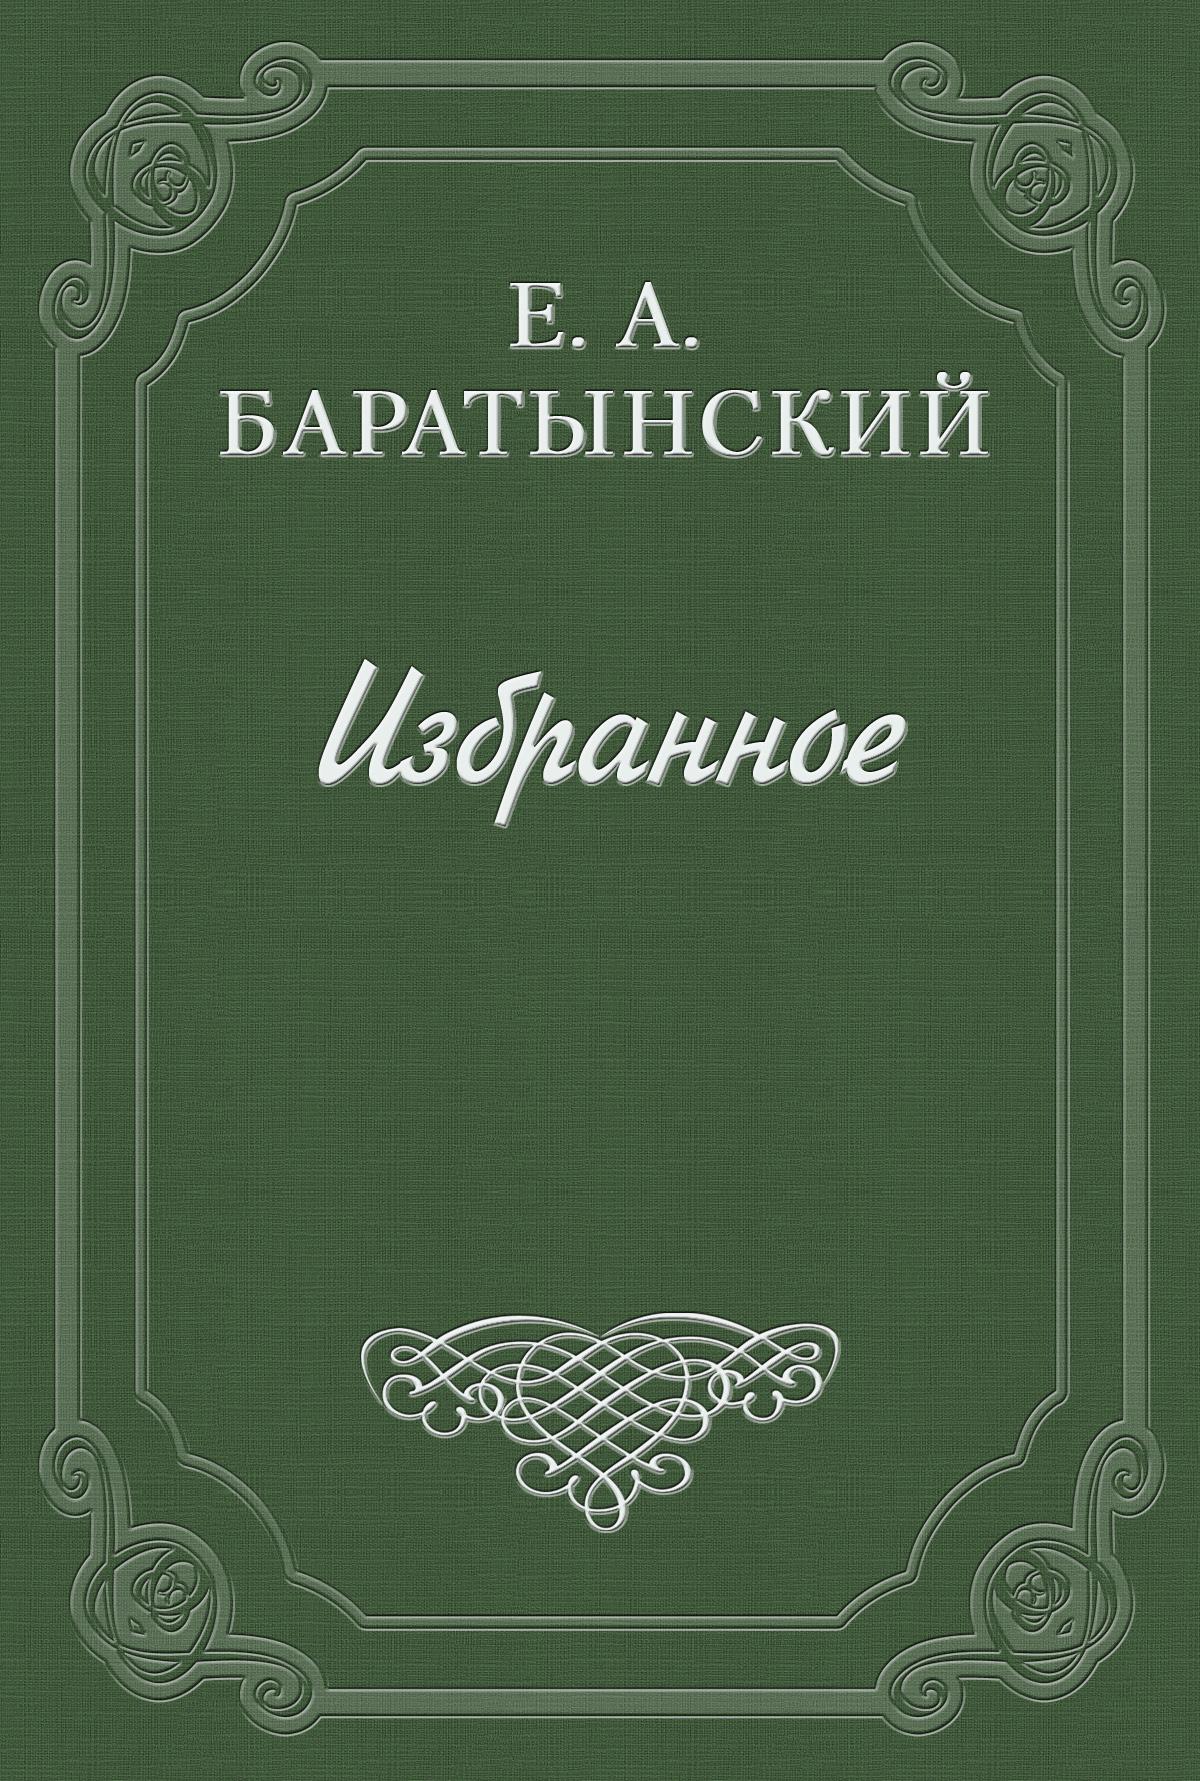 Евгений Абрамович Баратынский Бал евгений абрамович баратынский стихотворения